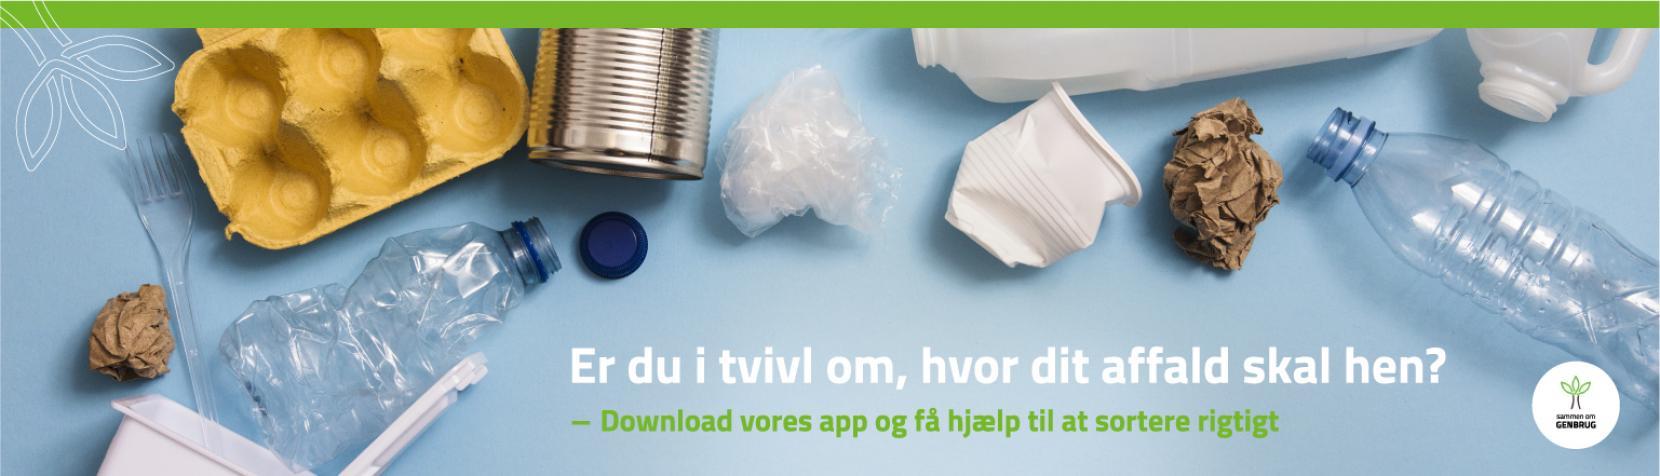 Topbanner for ny affalds-app